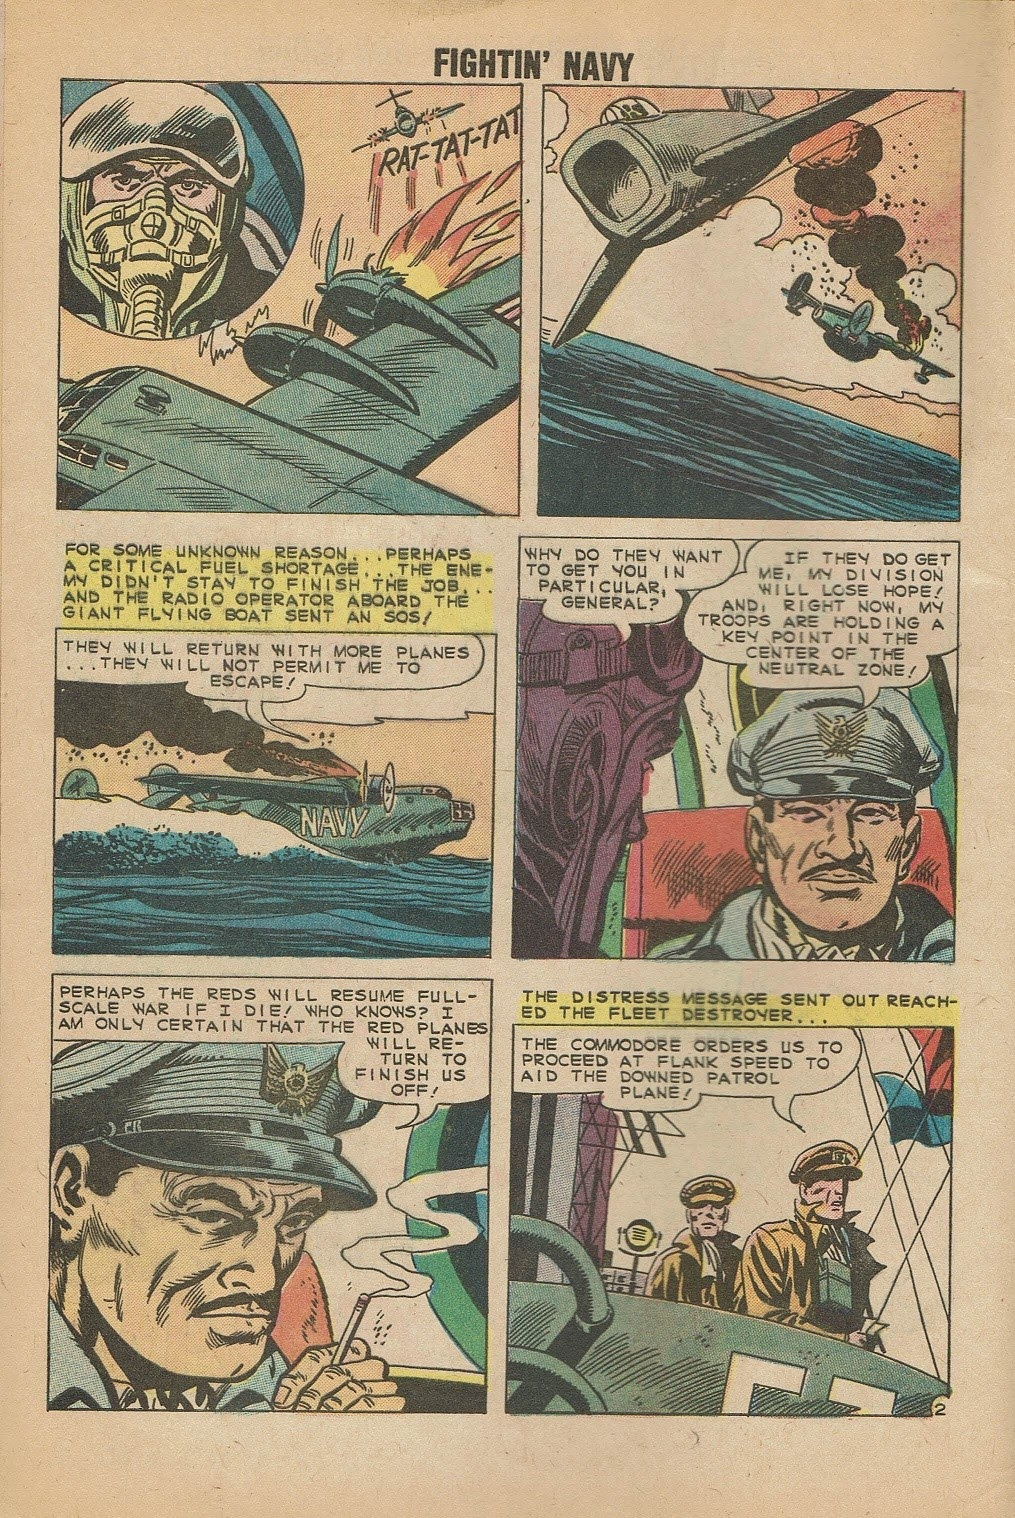 Read online Fightin' Navy comic -  Issue #95 - 4